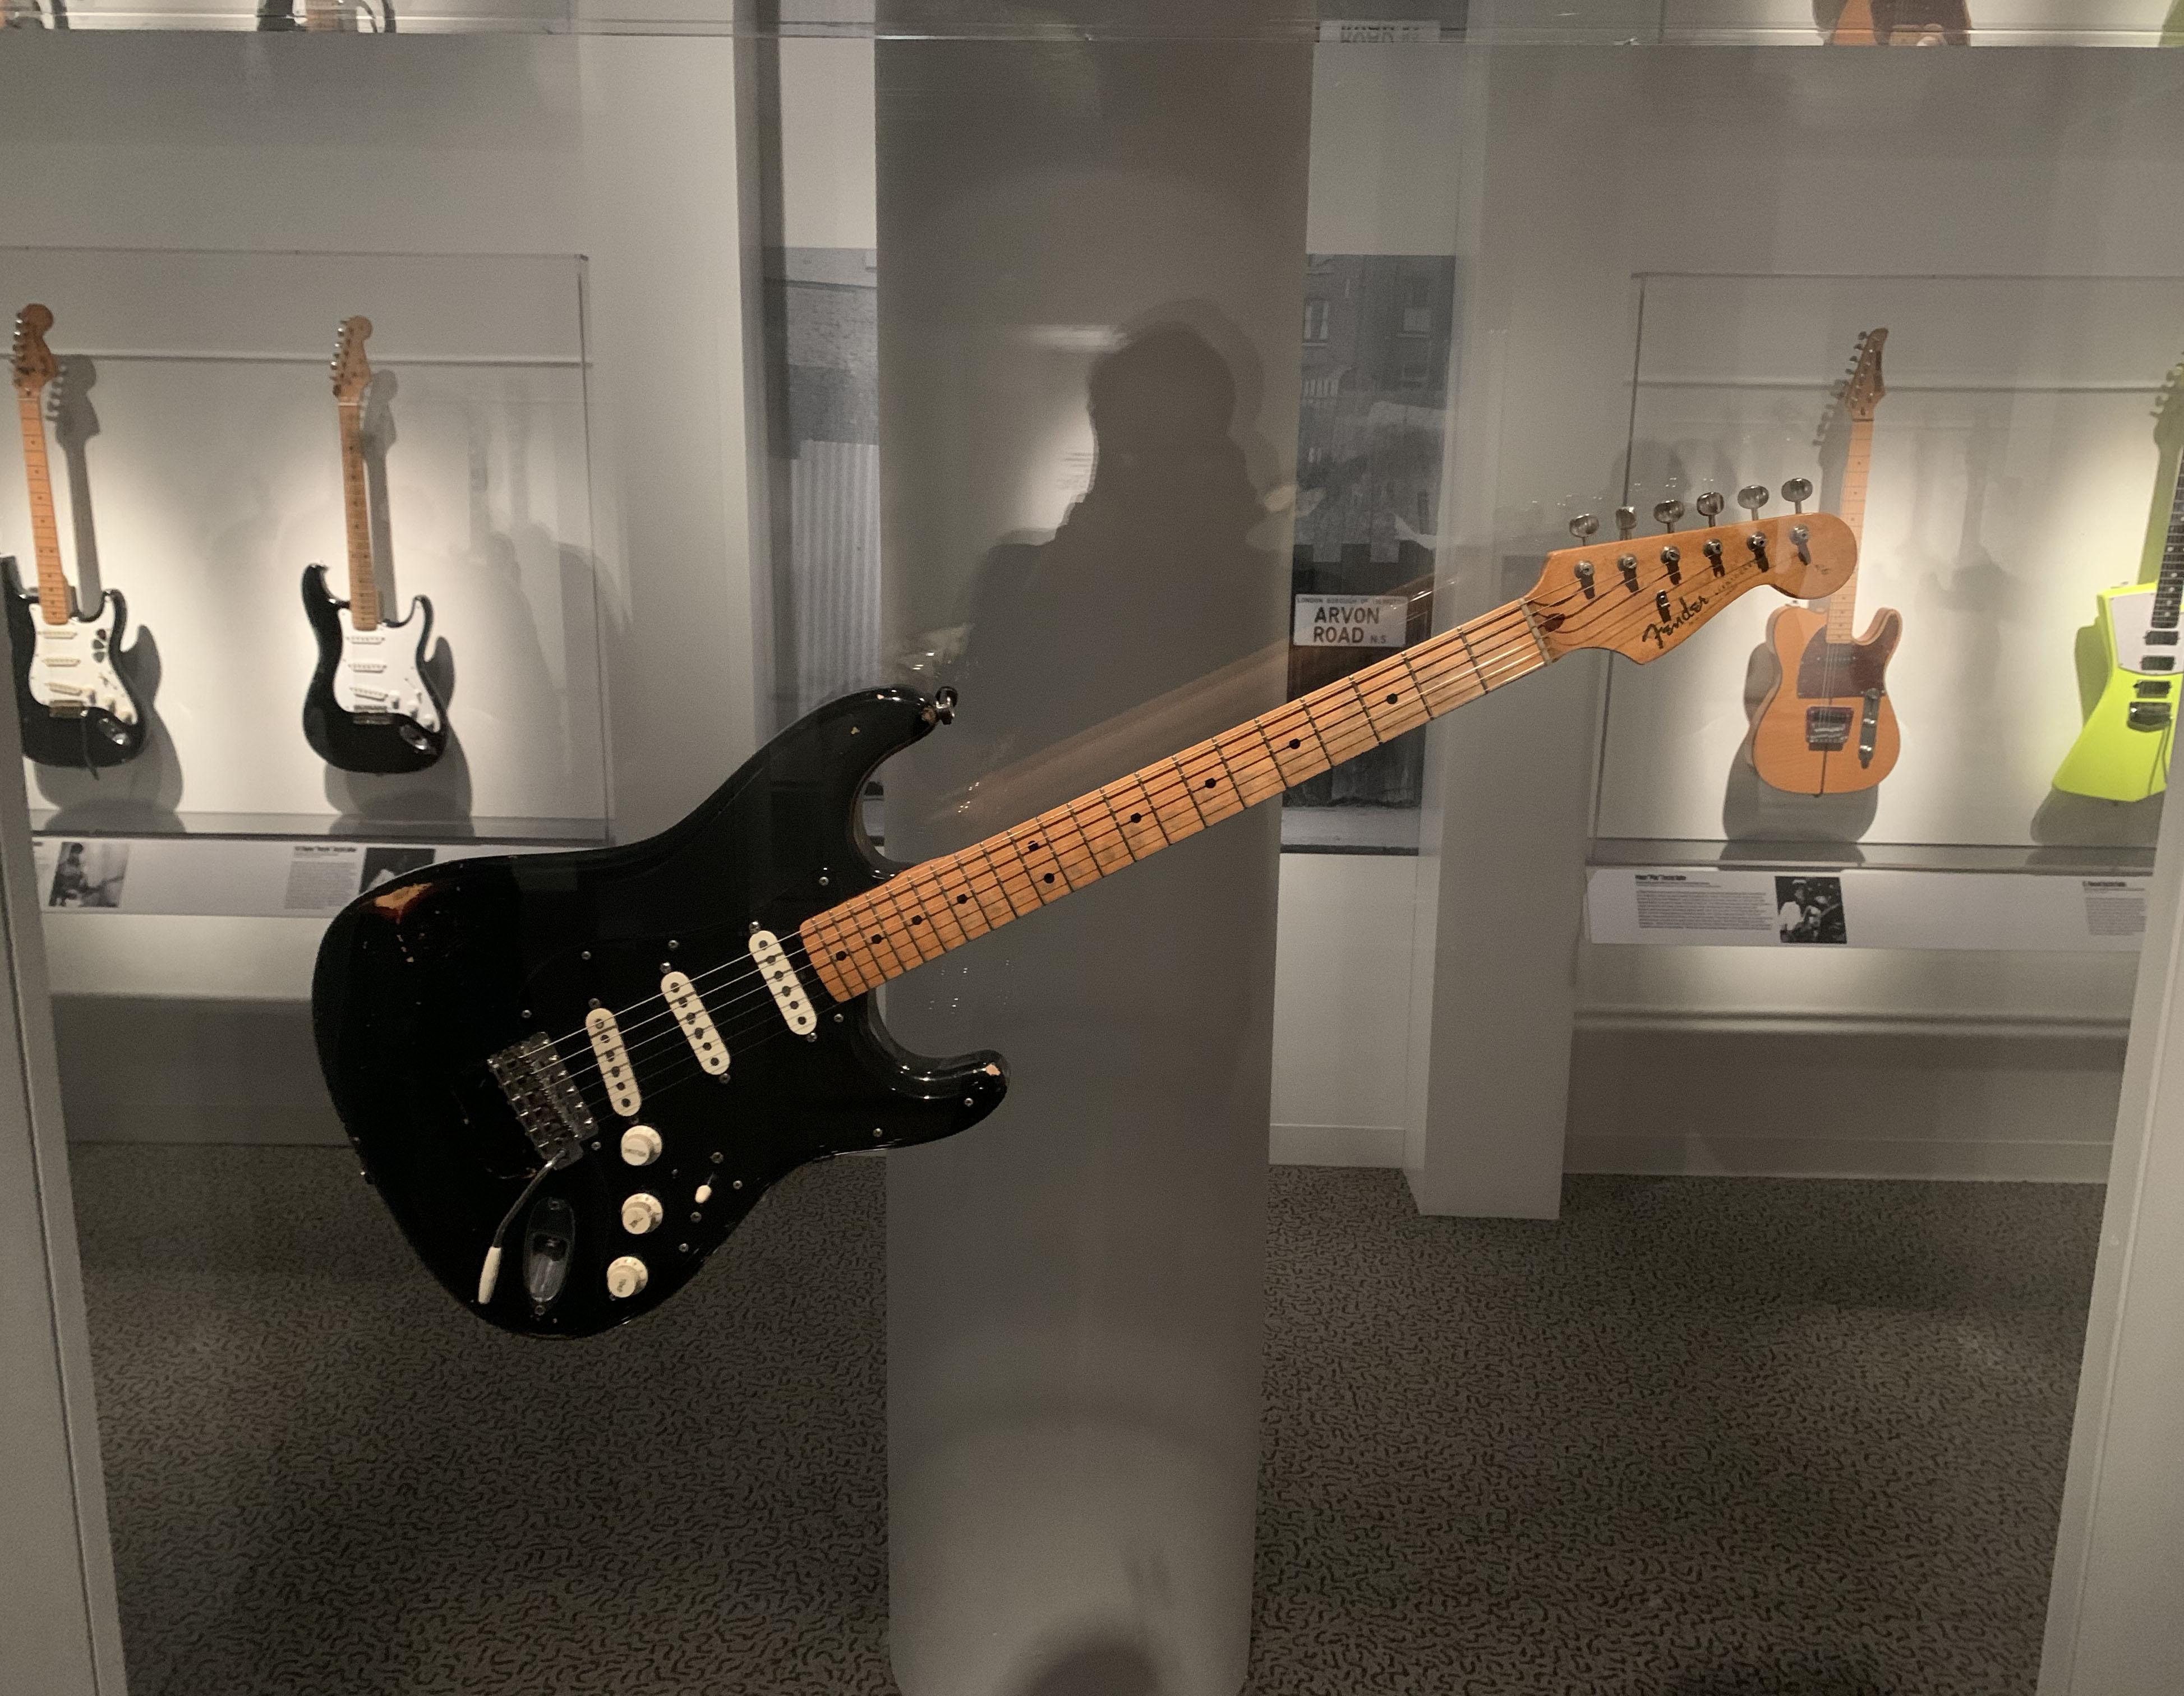 The Black Strat David Gilmour Pink Floyd